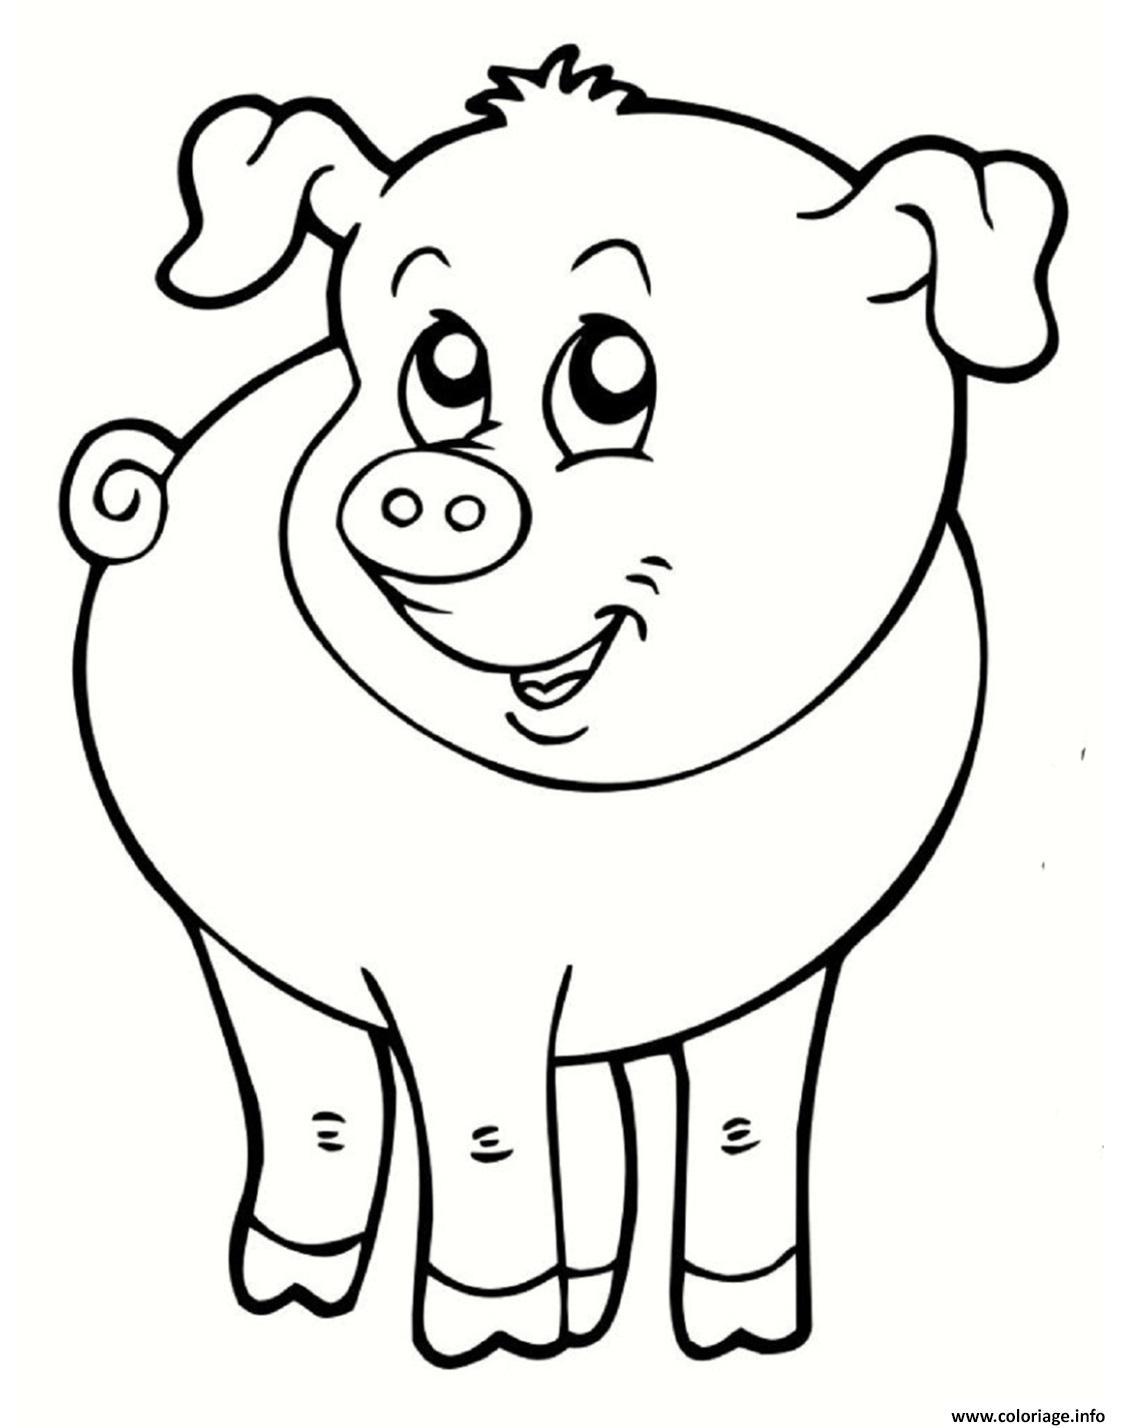 Coloriage Cochon Souriant Animal De La Ferme Dessin serapportantà Dessin À Colorier Cochon